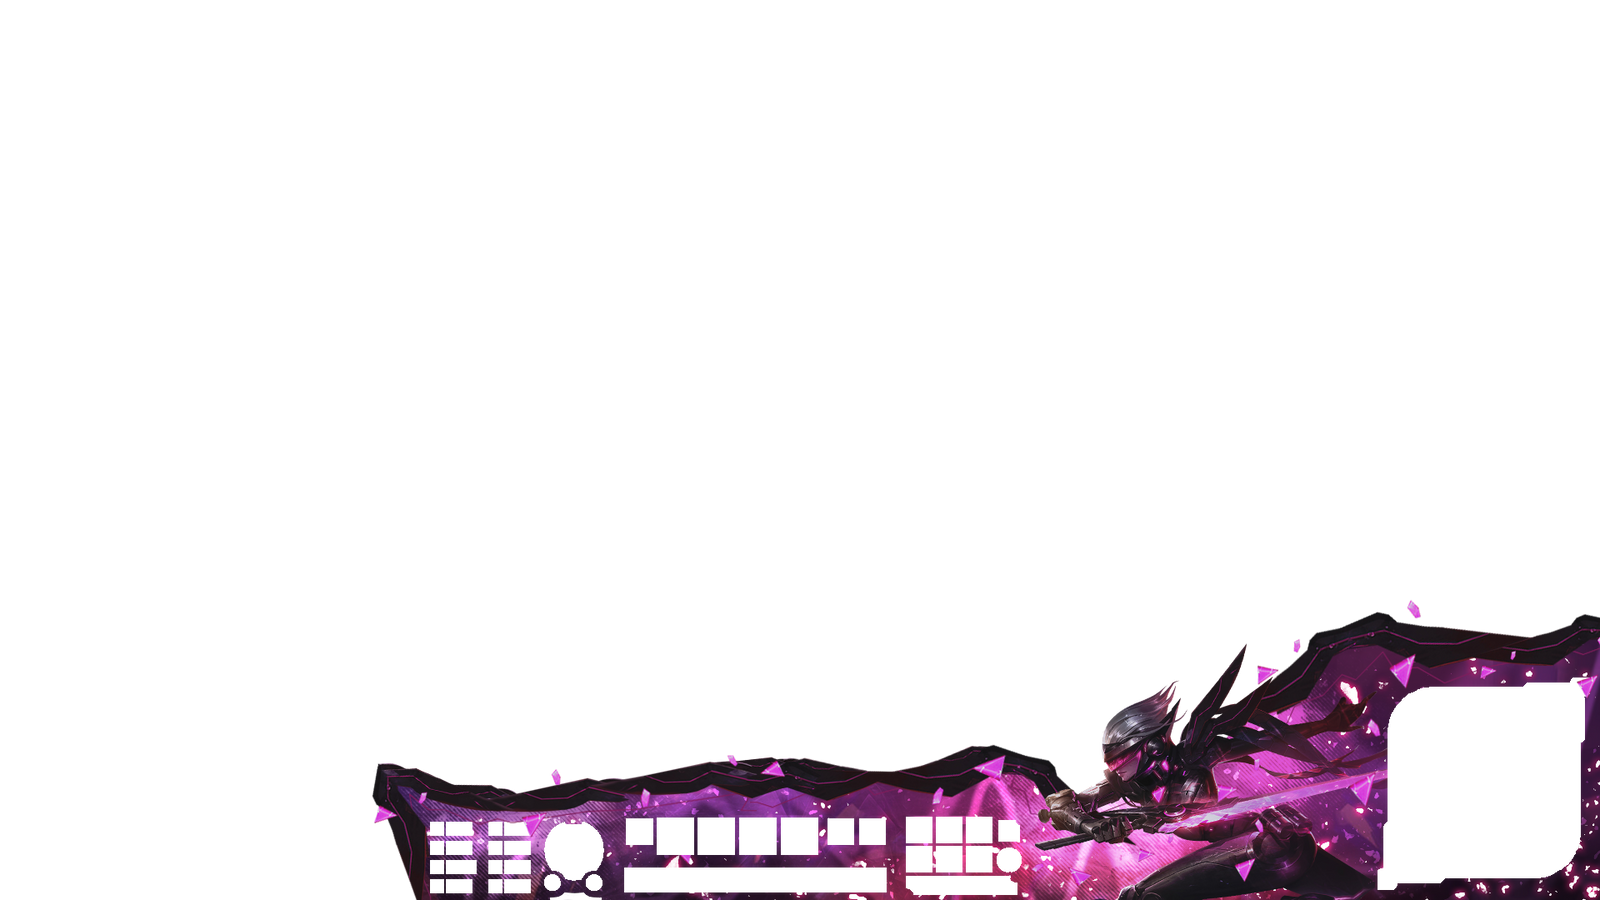 project fiora live wallpaper